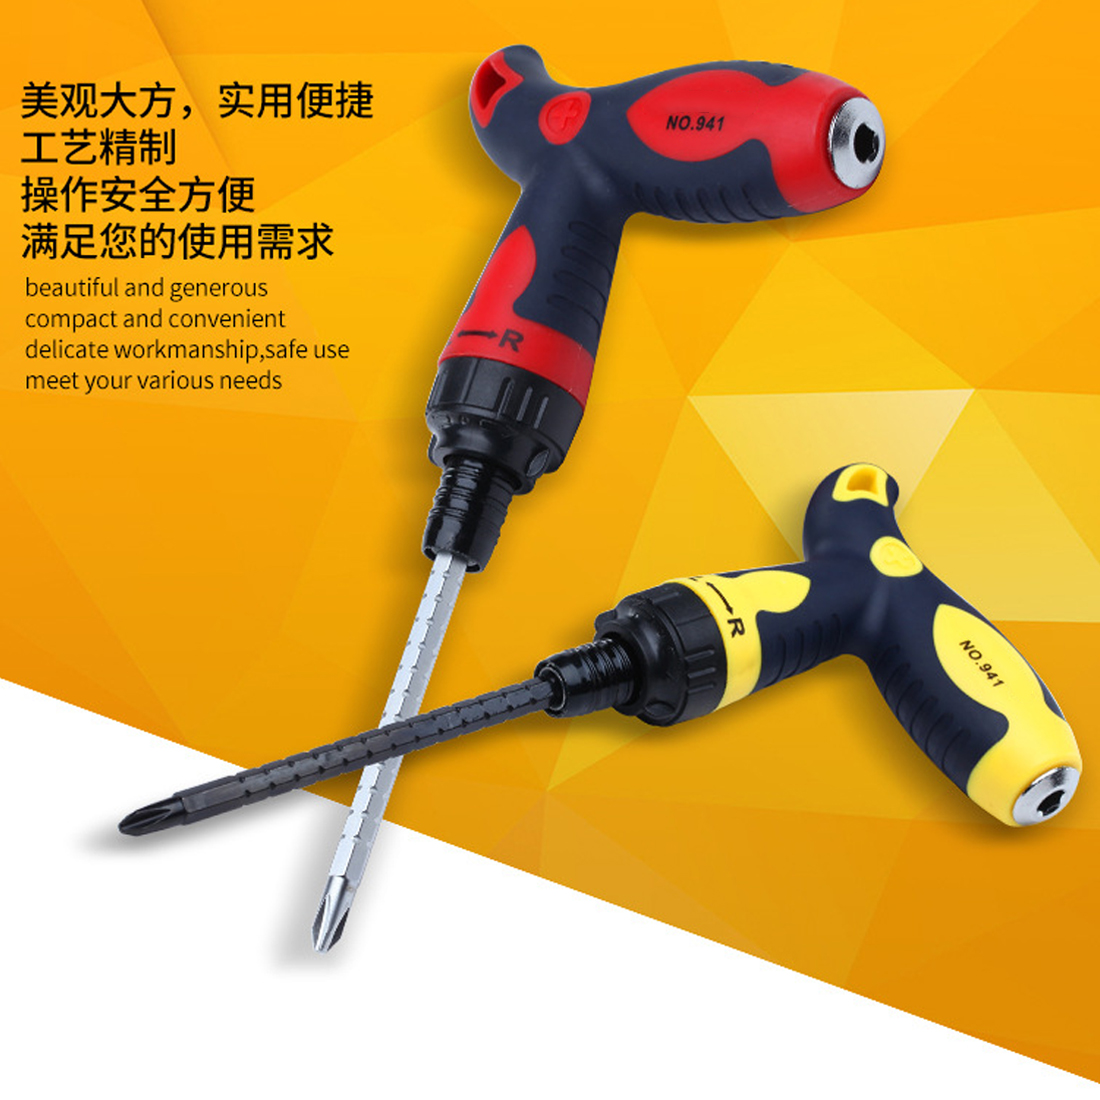 1PCS Screwdriver T-type Anti-slip Alloy Steel Multifunctional T Handle Ratchet Screwdriver Repair Hand Tools High-quality